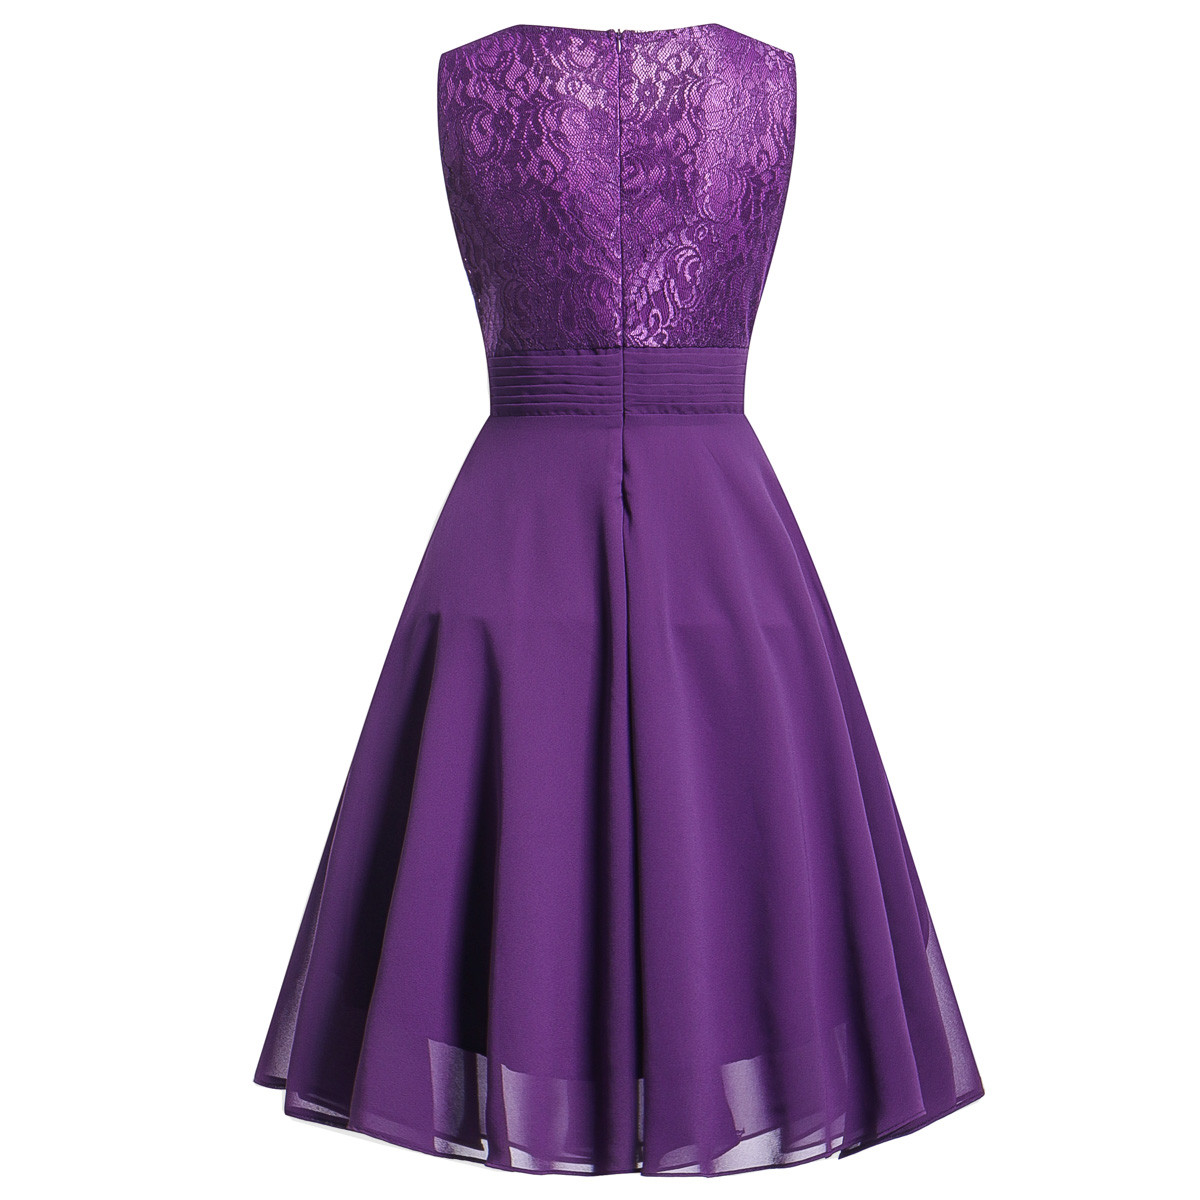 d9706e2f87dbd Women summer Dress pink Sleeveless Formal Ladies party knee-length  Bridesmaid Lace Long Dresses Vestidos jurken sukienka #YL